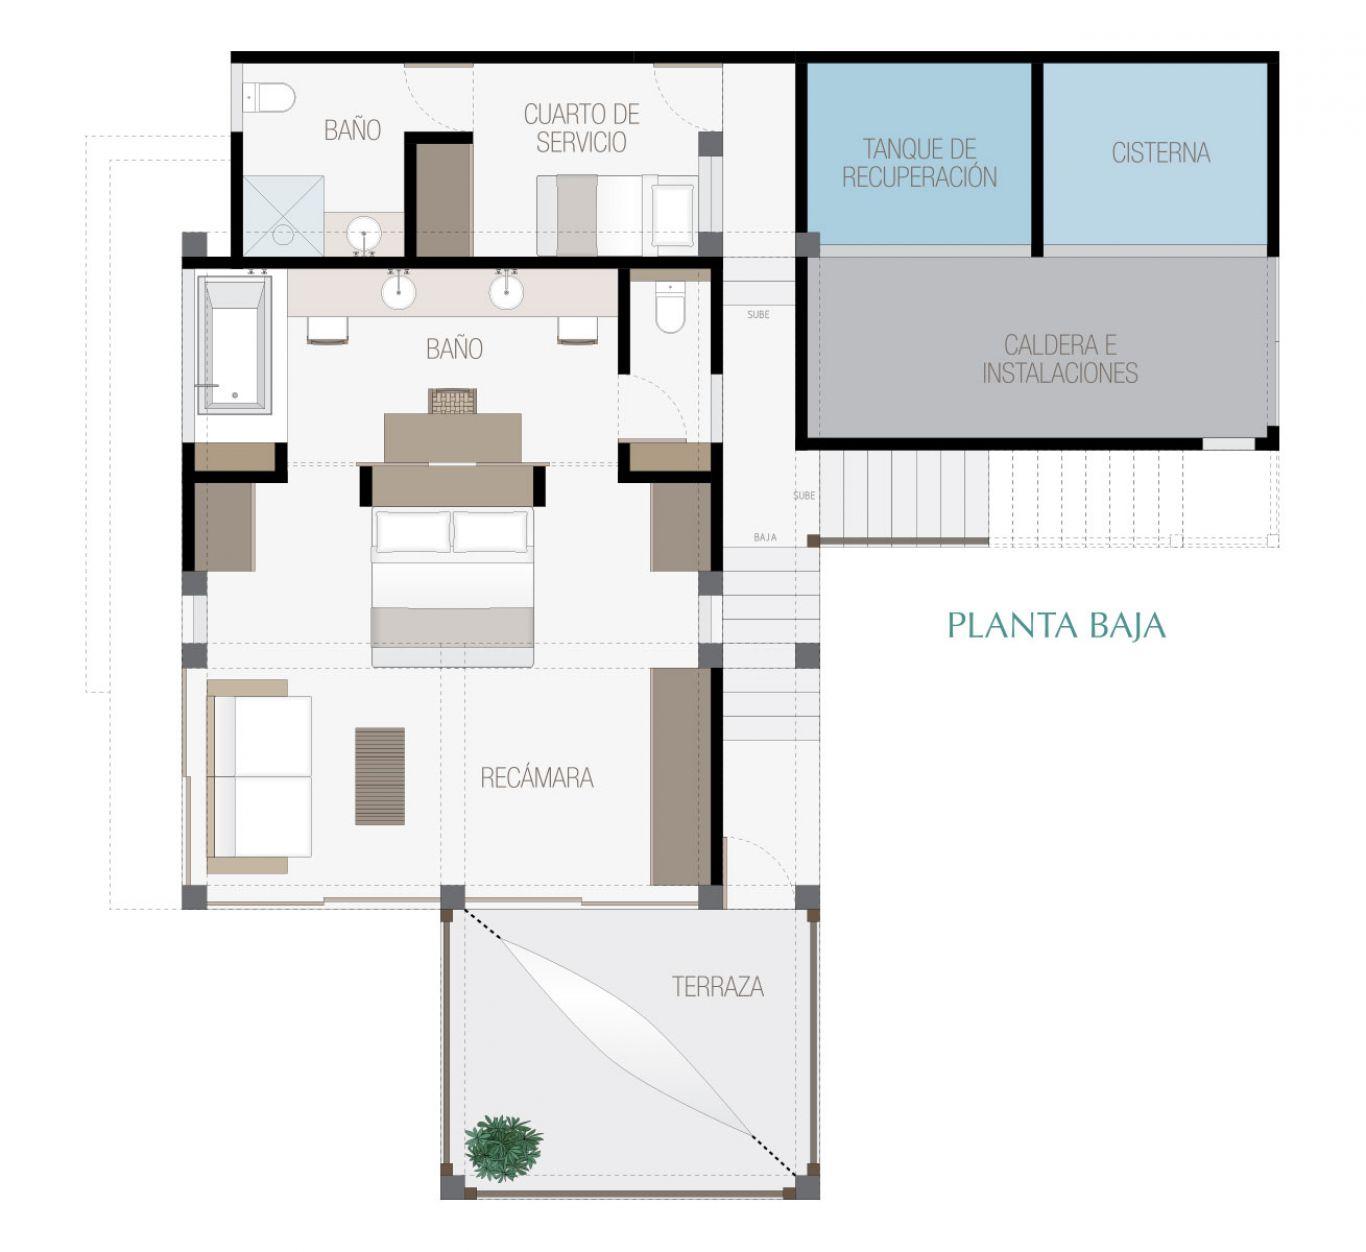 Manai, id 1519068, no 2, plano de villa 9, 302